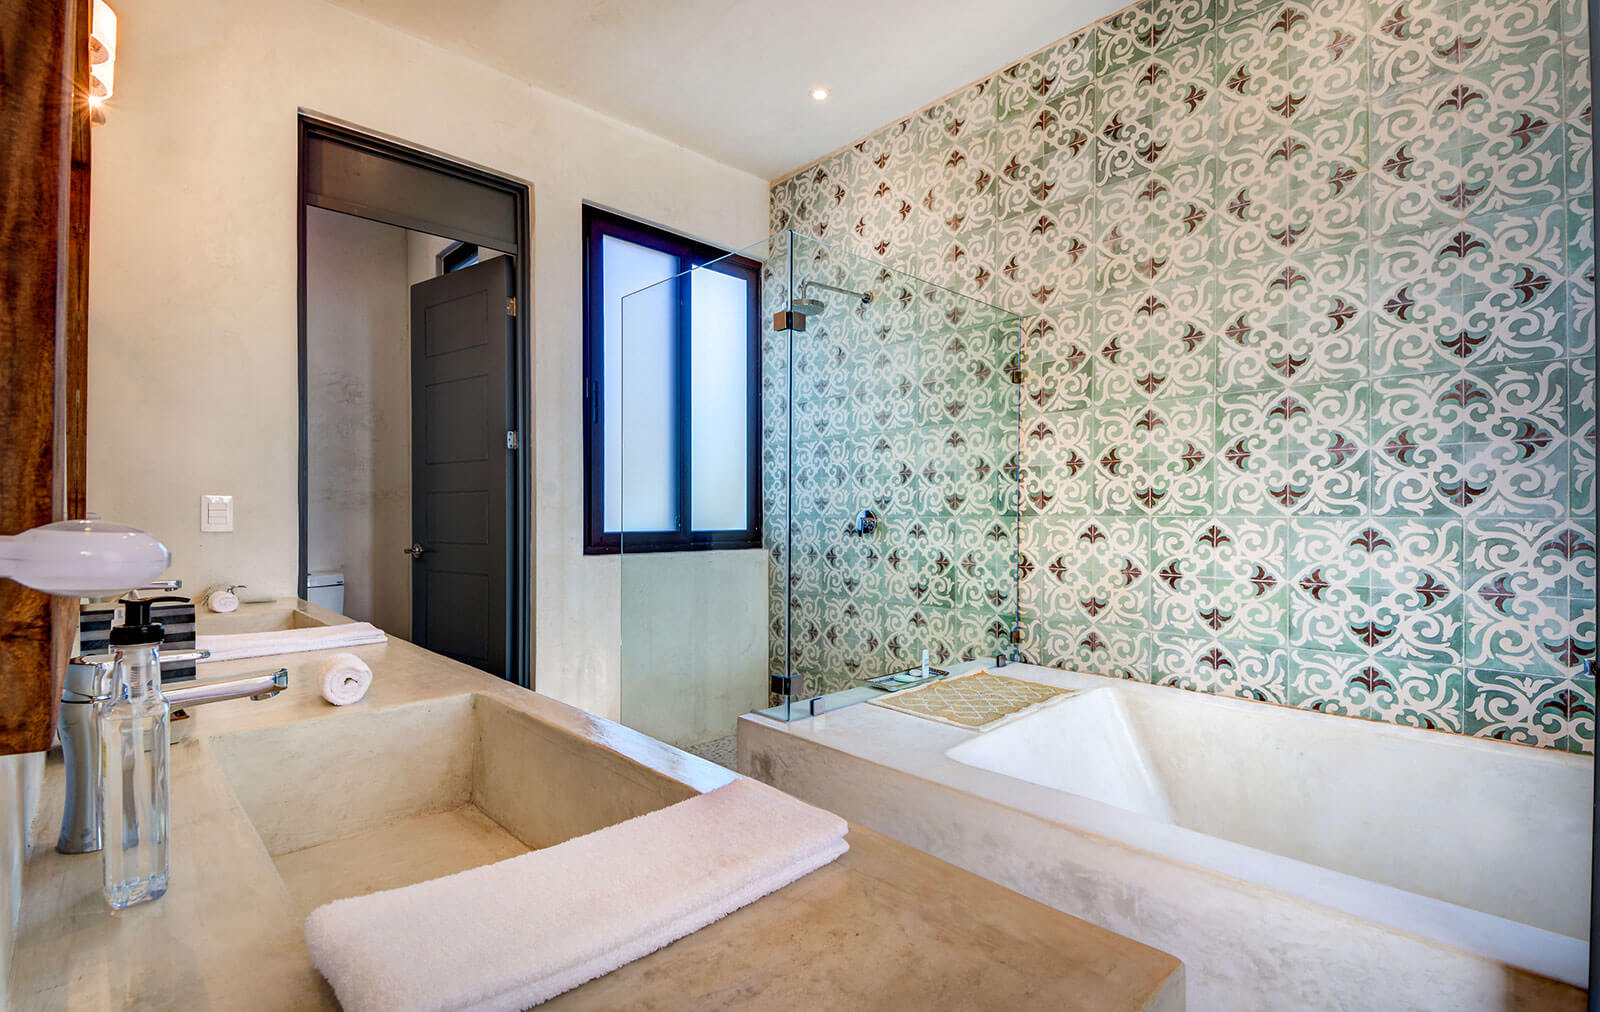 Maya_Luxe_Riviera_Maya_Luxury_Villas_Experiences_Tulum_Soliman_Bay_5_Bedrooms_30.jpg